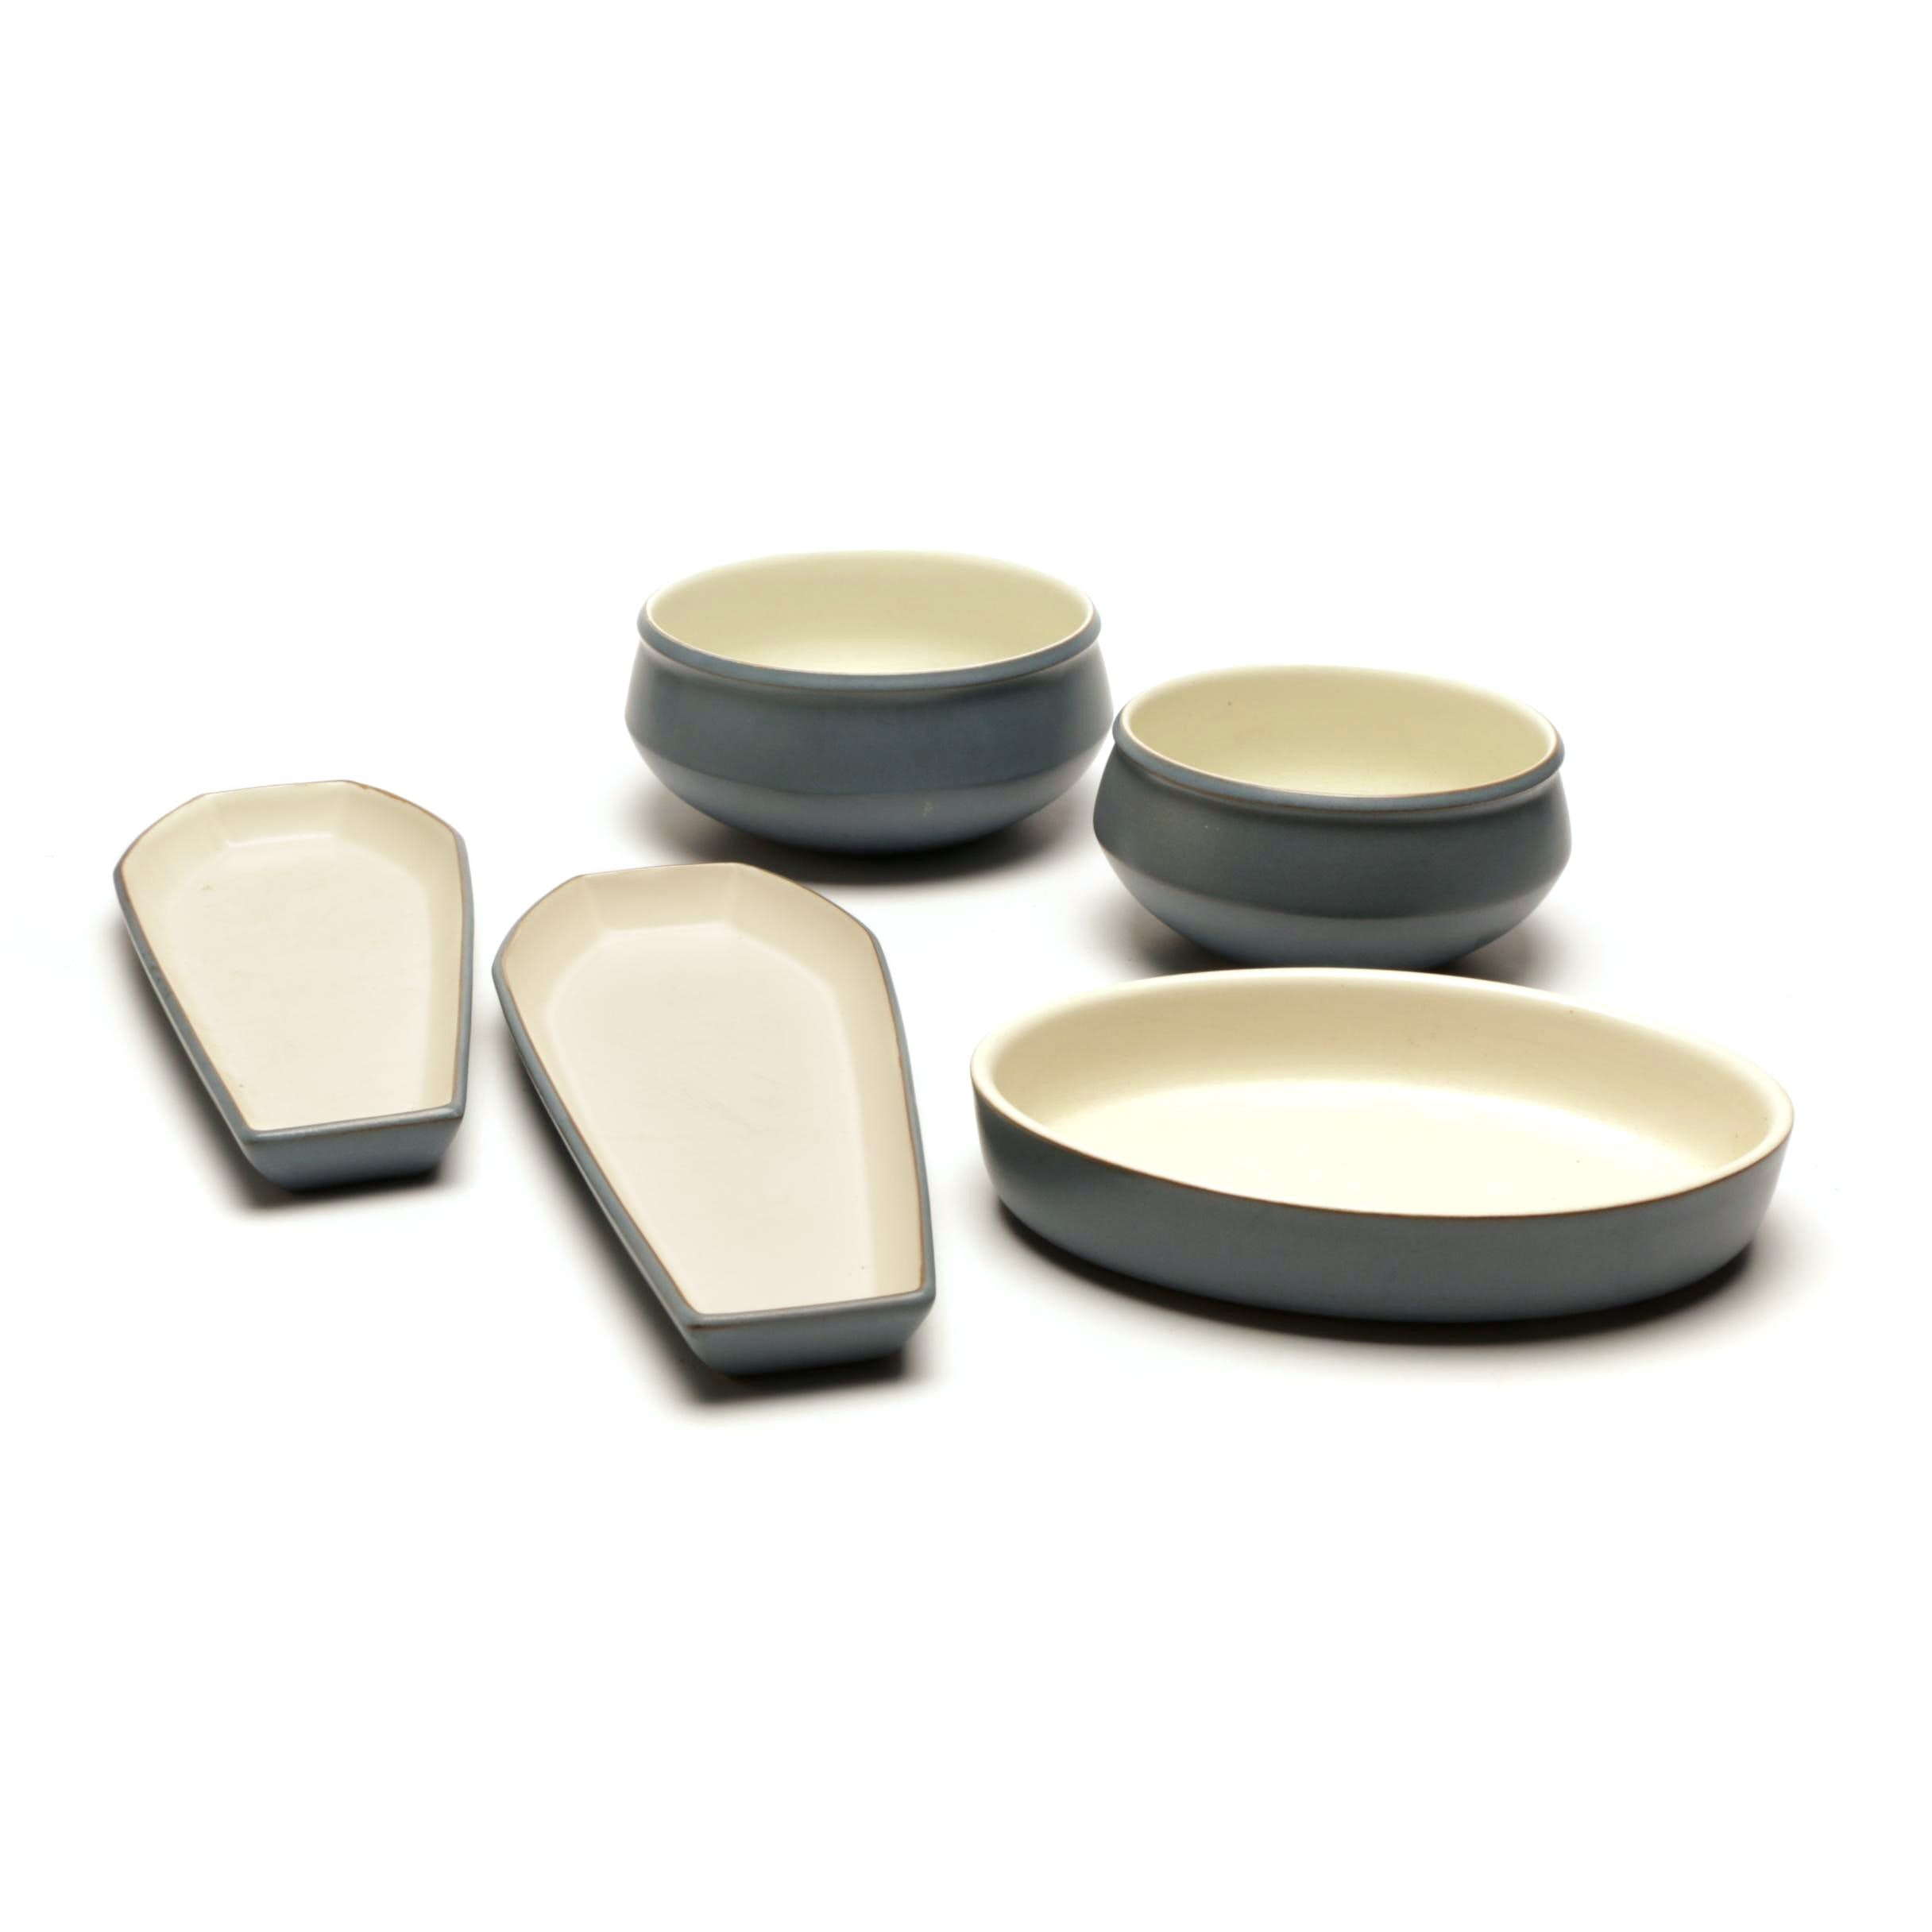 Vintage Denby 'Echo Blue' Stoneware Set